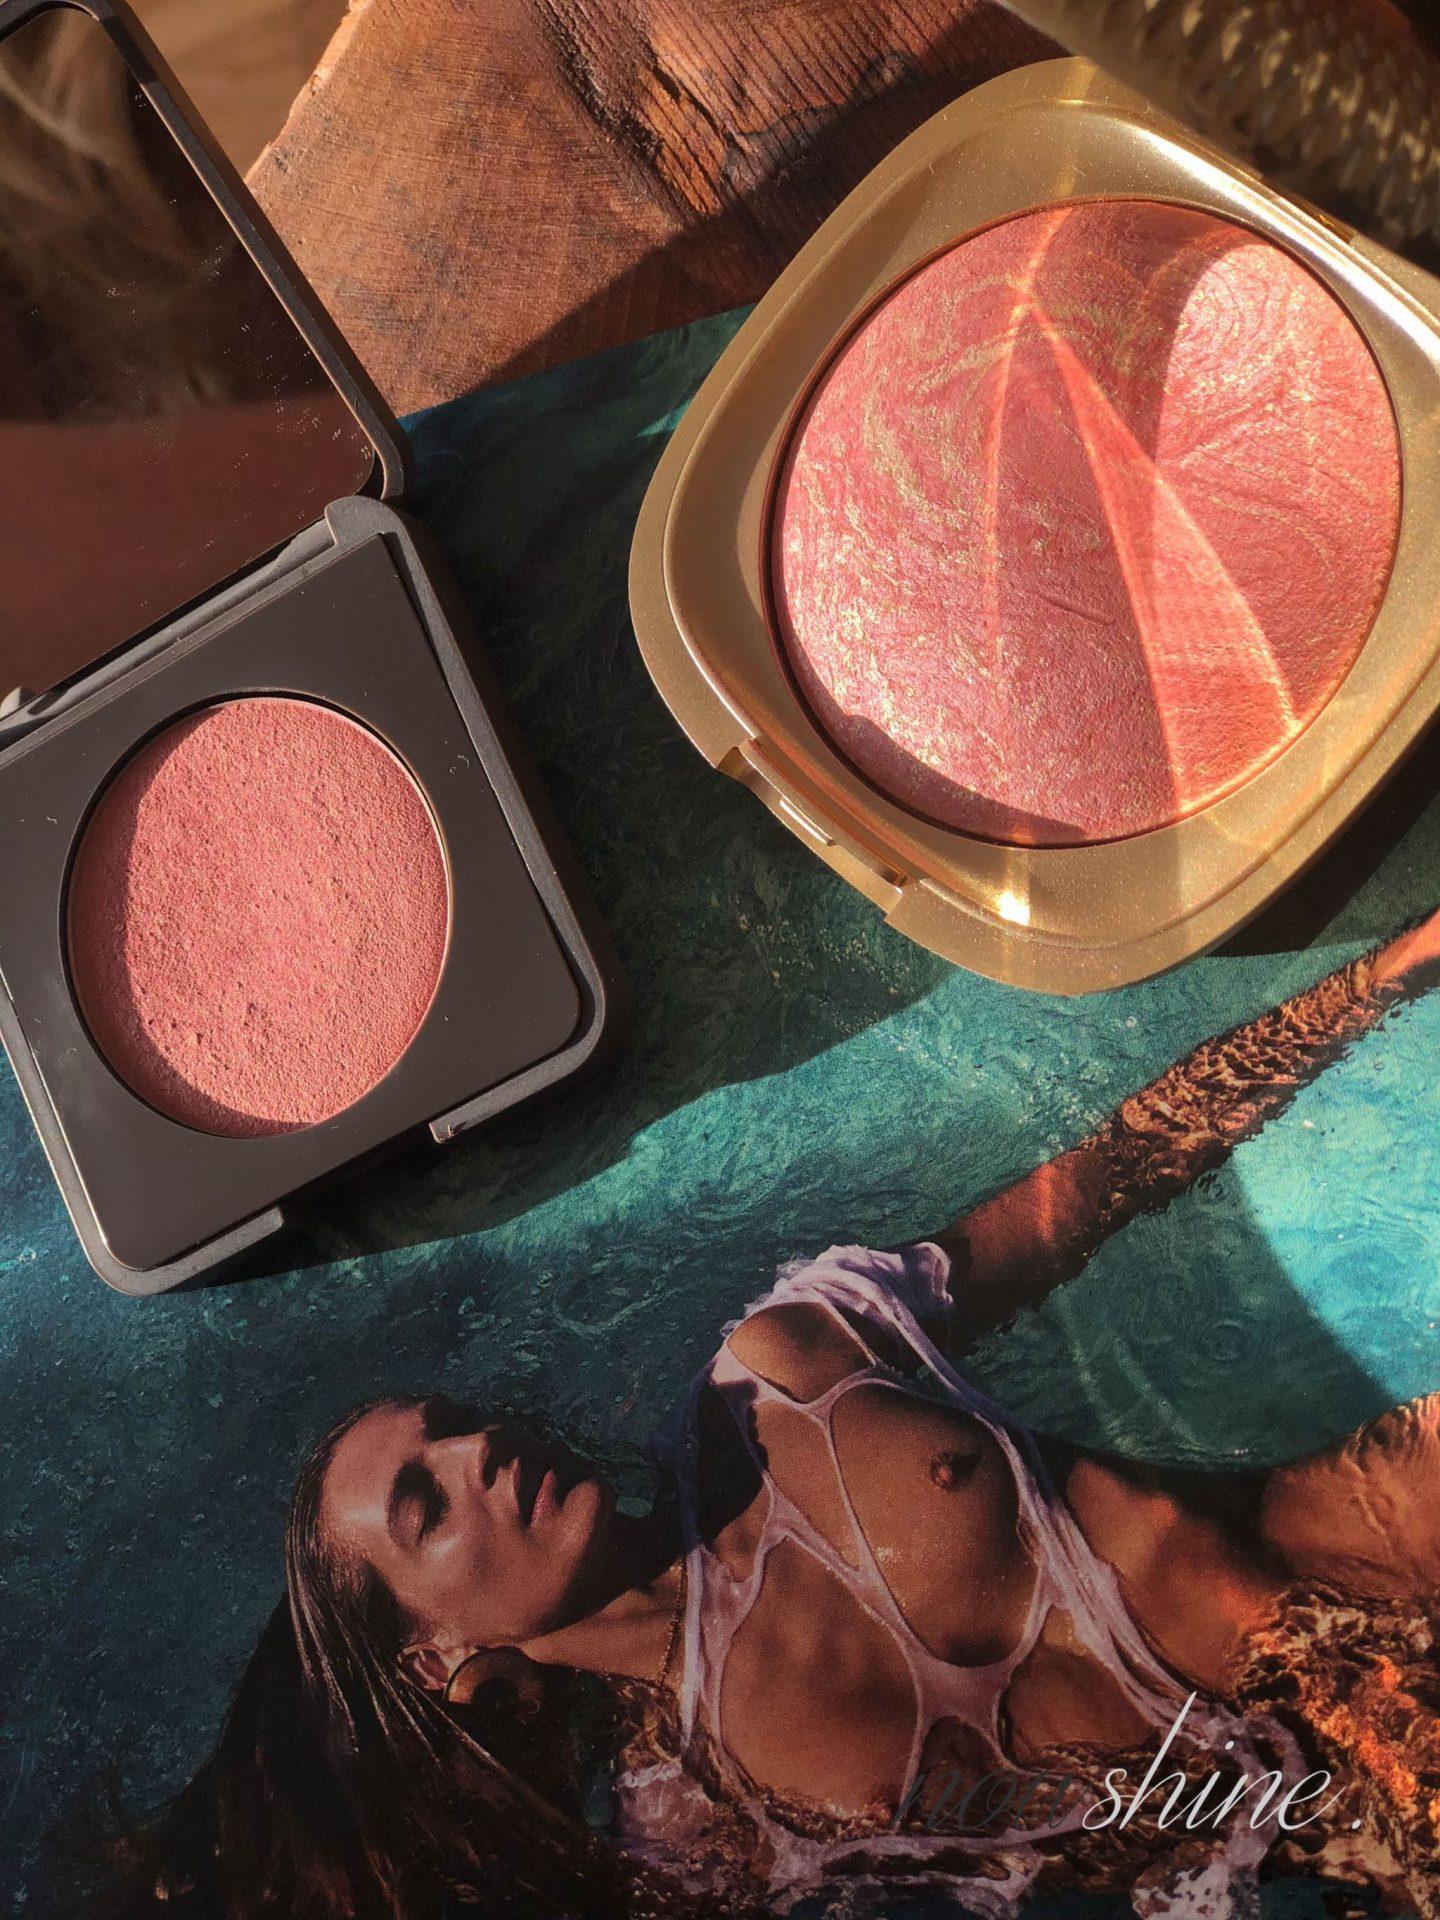 Wie gut ist Kiko - Green Me Blush - Gold Waves Blush- Glossy Dream Lipstick - Nowshine Beauty Blog ü 40